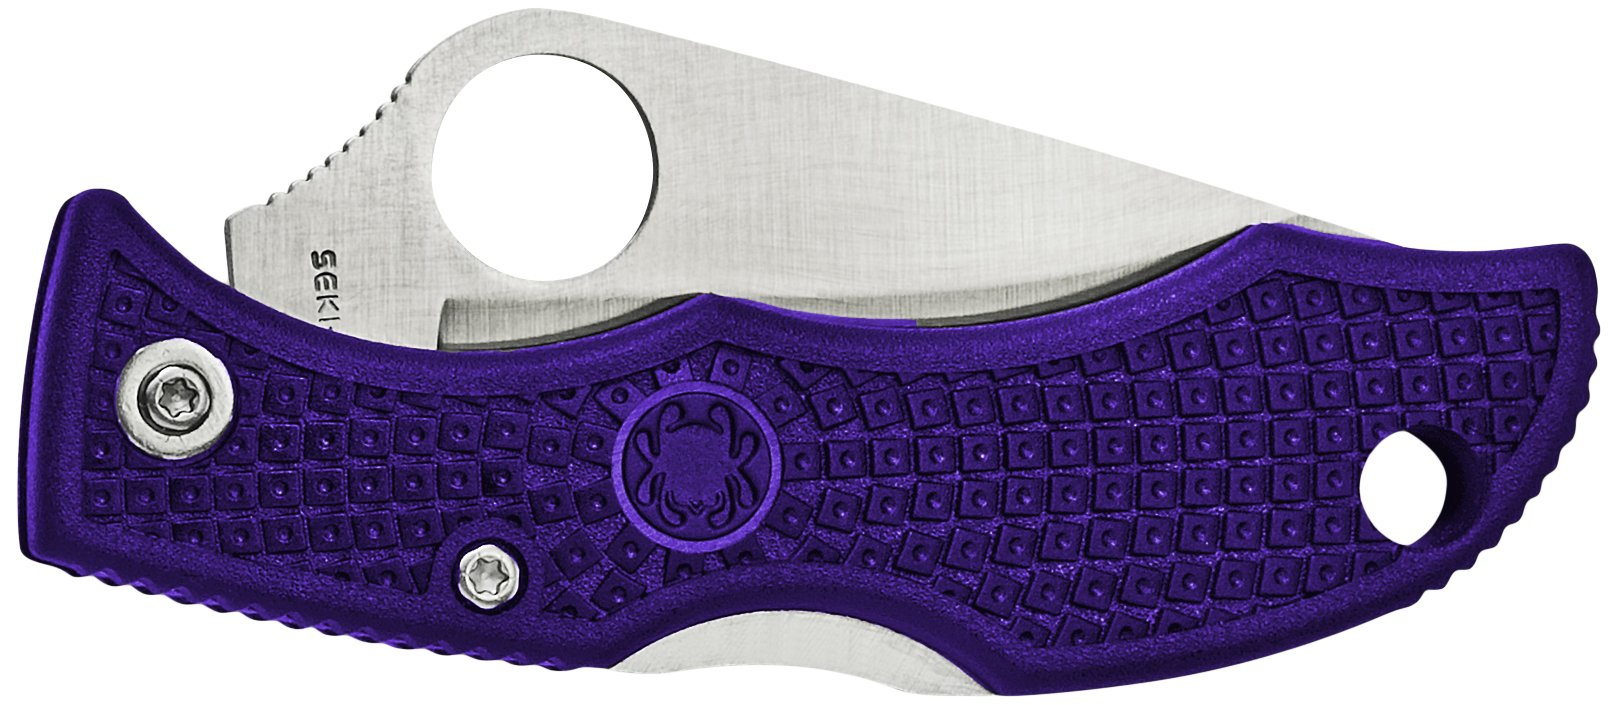 Spyderco Ladybug 3 Plain Edge Folding Knife, Purple by Spyderco (Image #2)